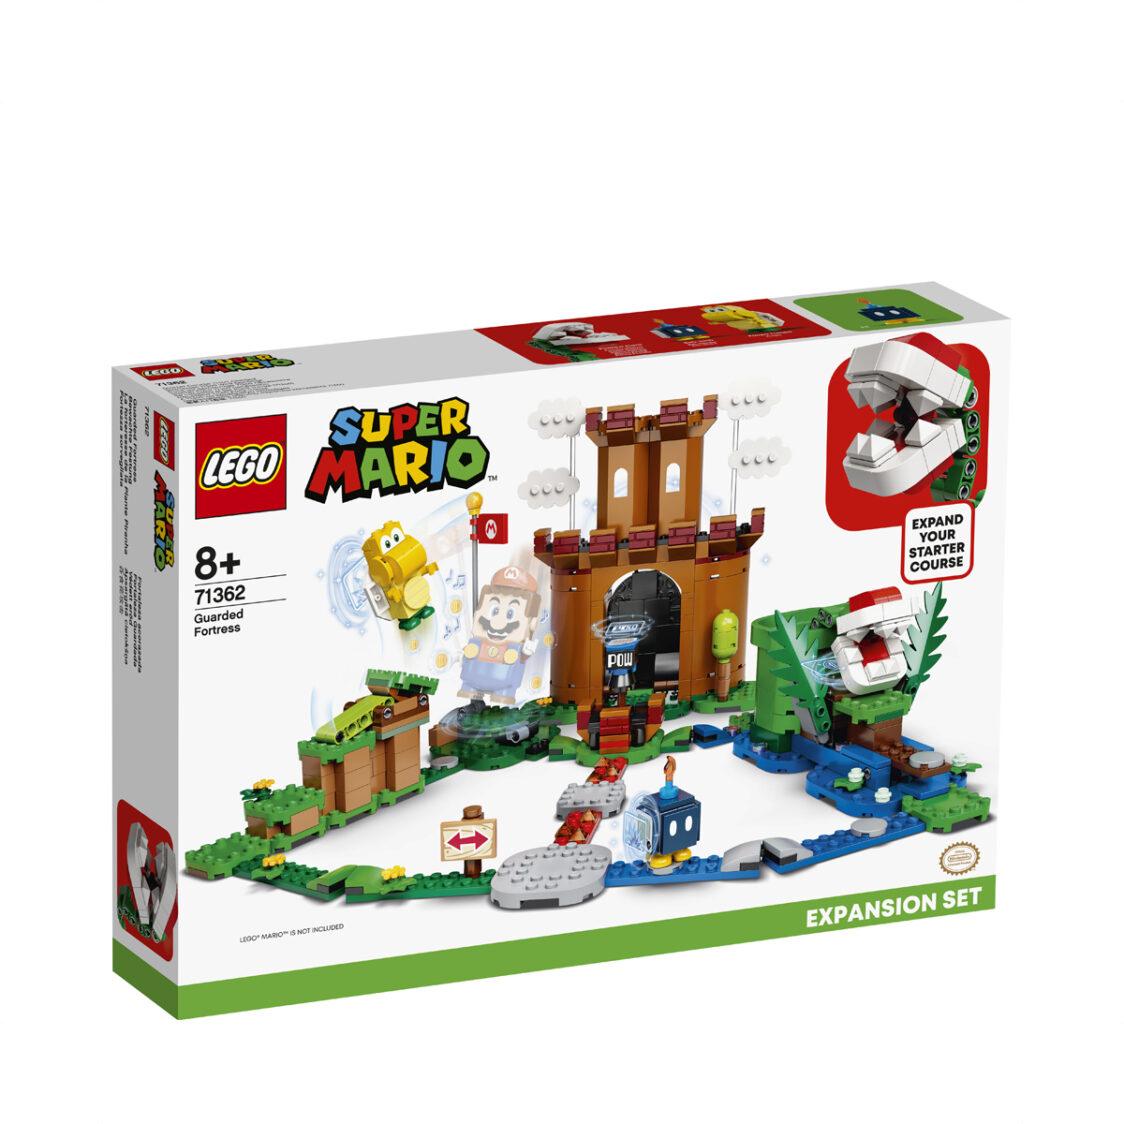 LEGO Guarded Fortress Expansion Set 71362 V29